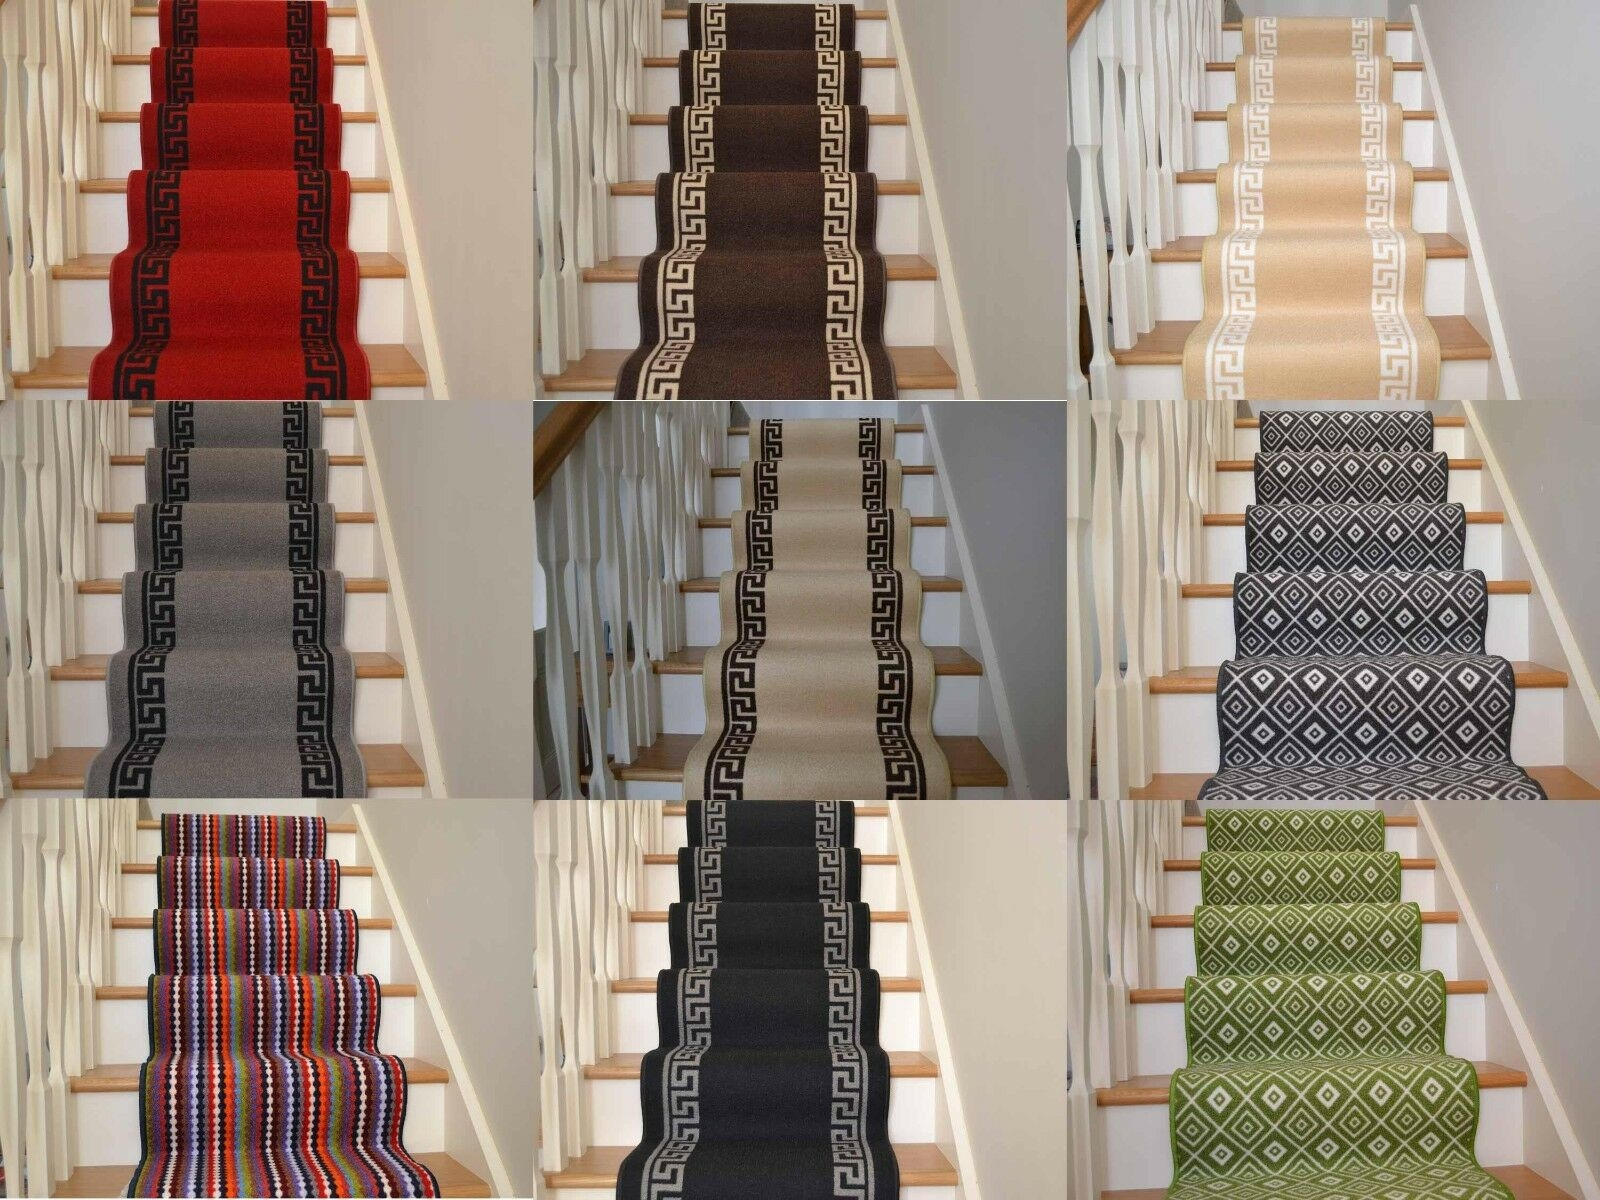 New Very Long Narrow Thin Stairway Staircase Carpet Runner Rugs | Carpet Runners For Stairs | Brown | Herringbone | Blue | Design | Wool